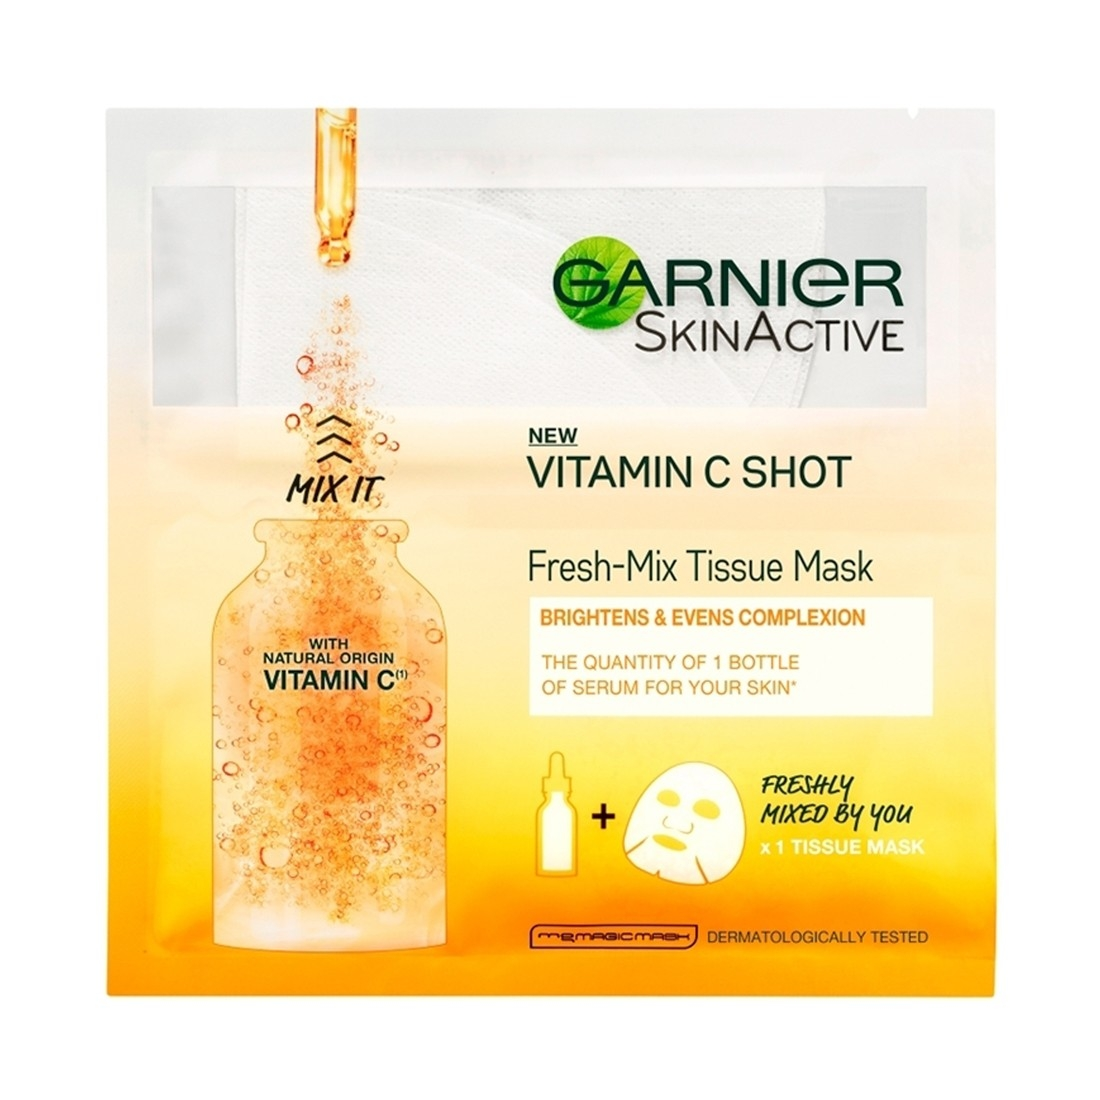 Garnier Skin Active Vitamin C Shot Fresh-Mix Tissue Mask 33g